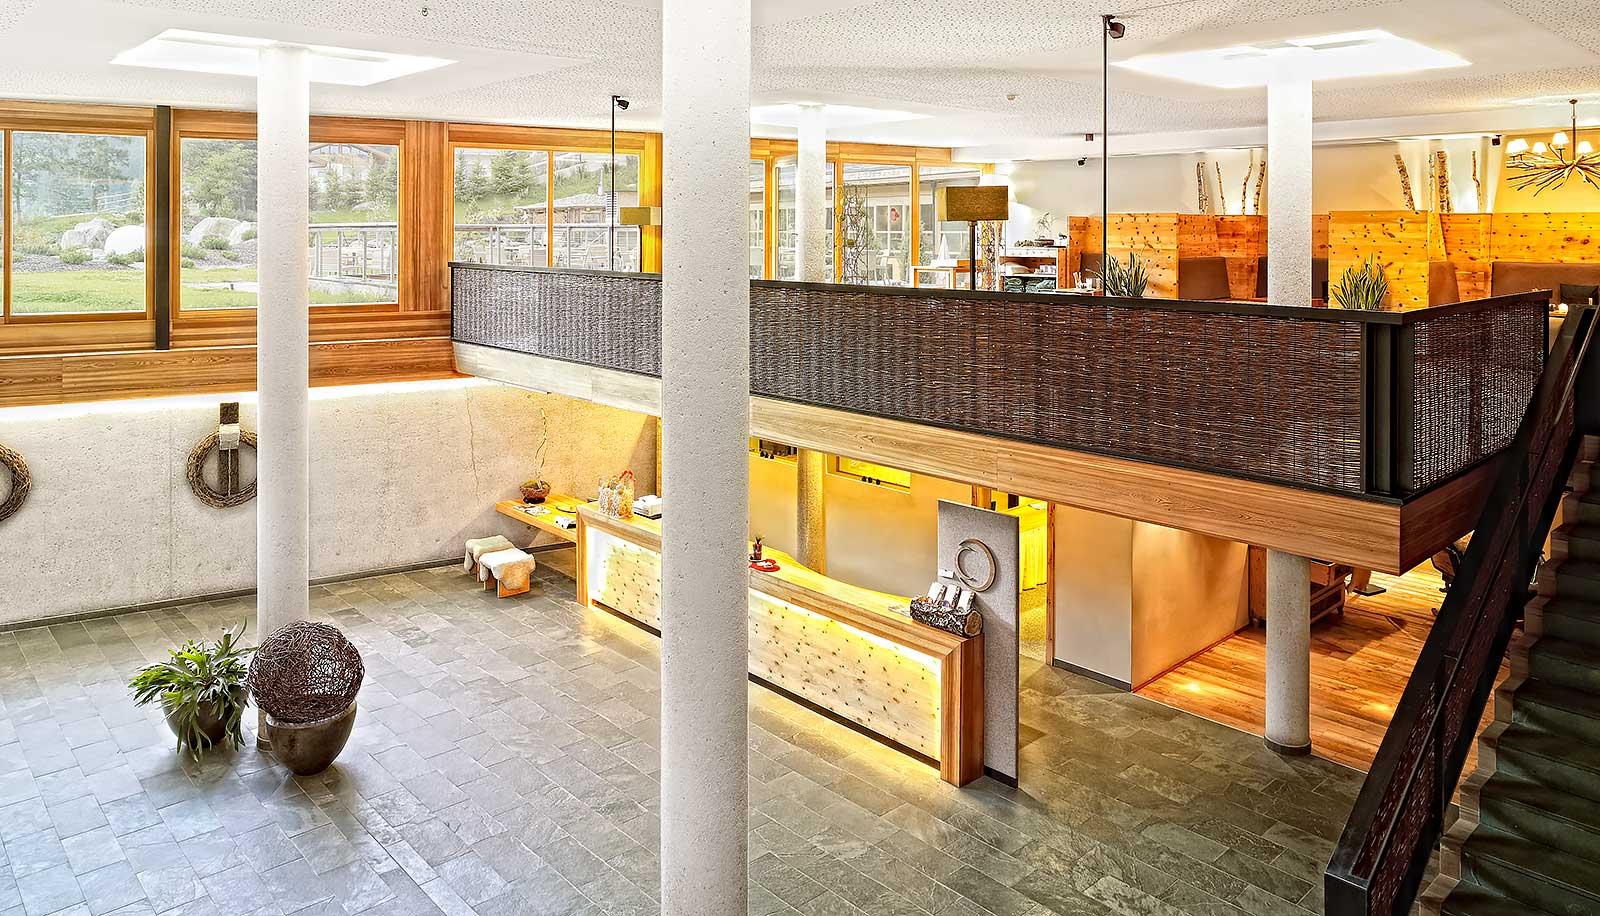 Life balance hotel arosea im ultental agbs leistungen for Designhotel ultental